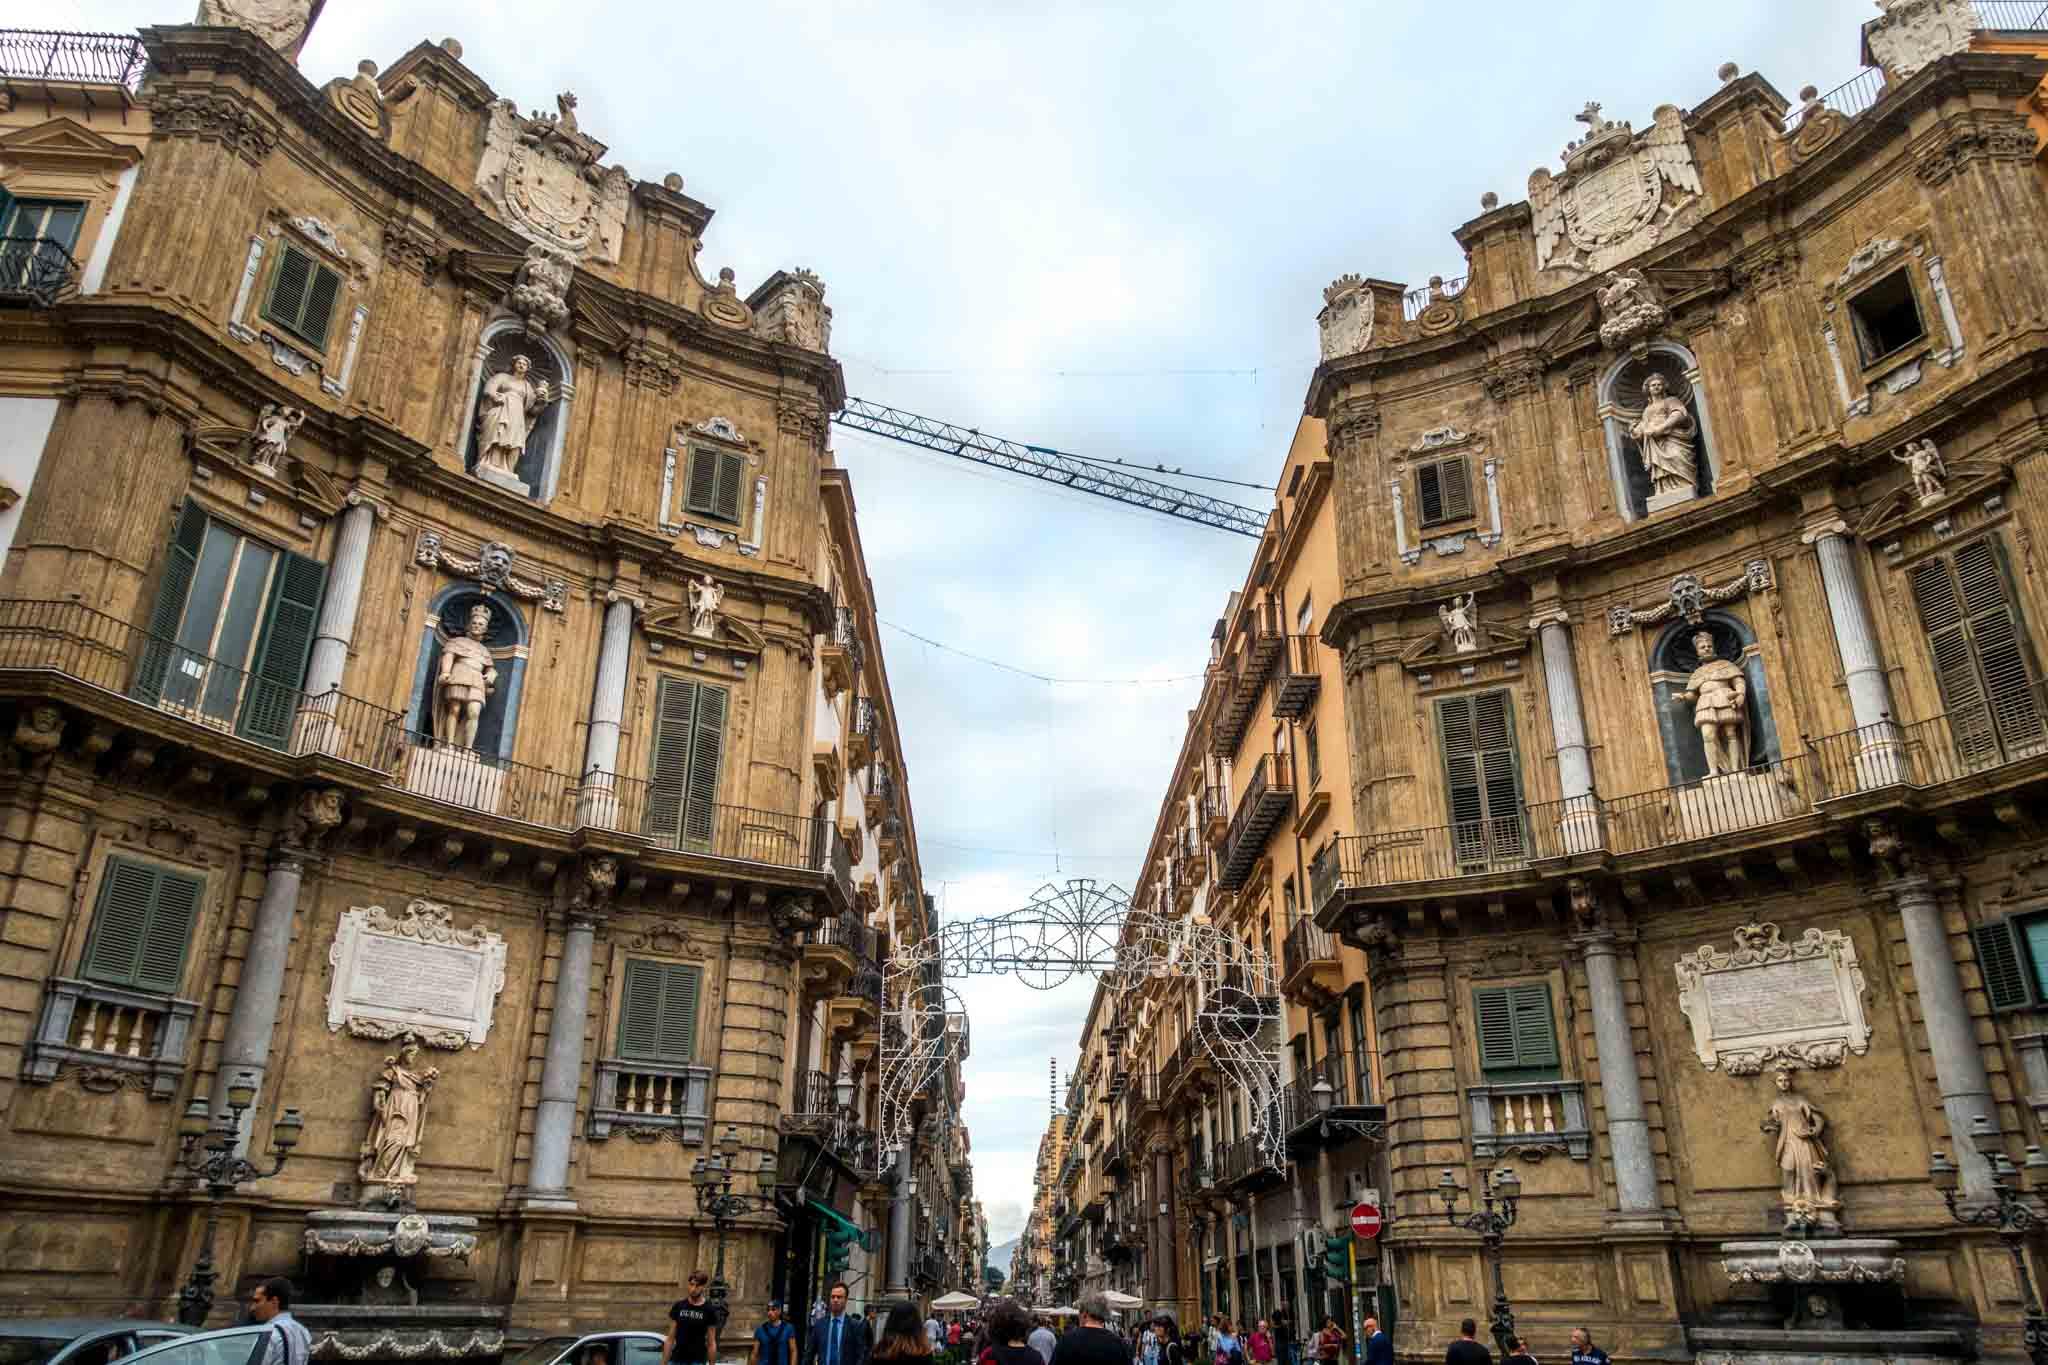 Street in Palermo, Sicily